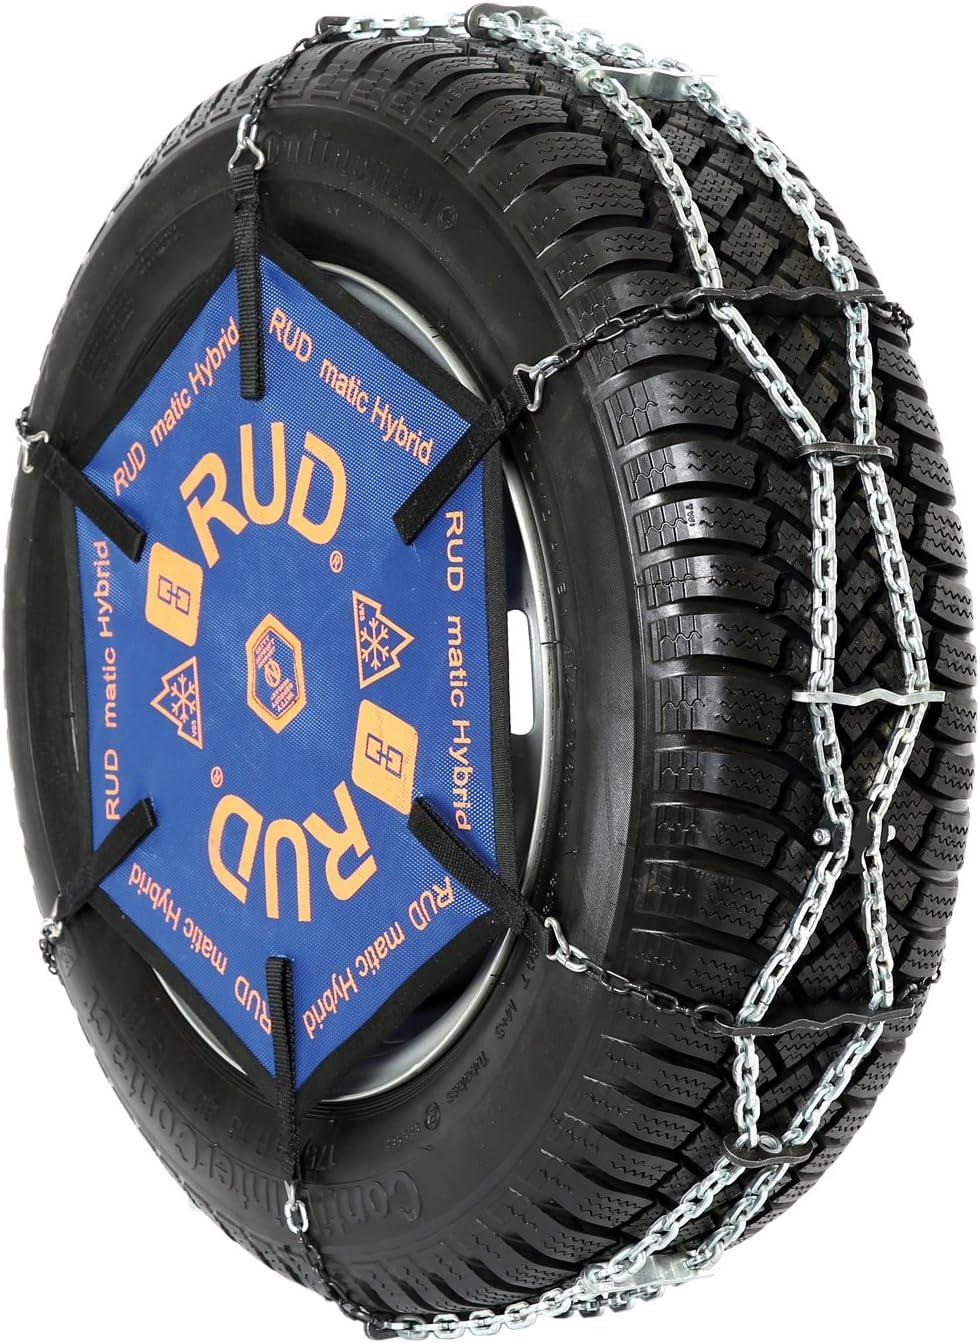 Gr Rud 4717321 Schneeketten Rudmatic Hybrid 1 Paar H109